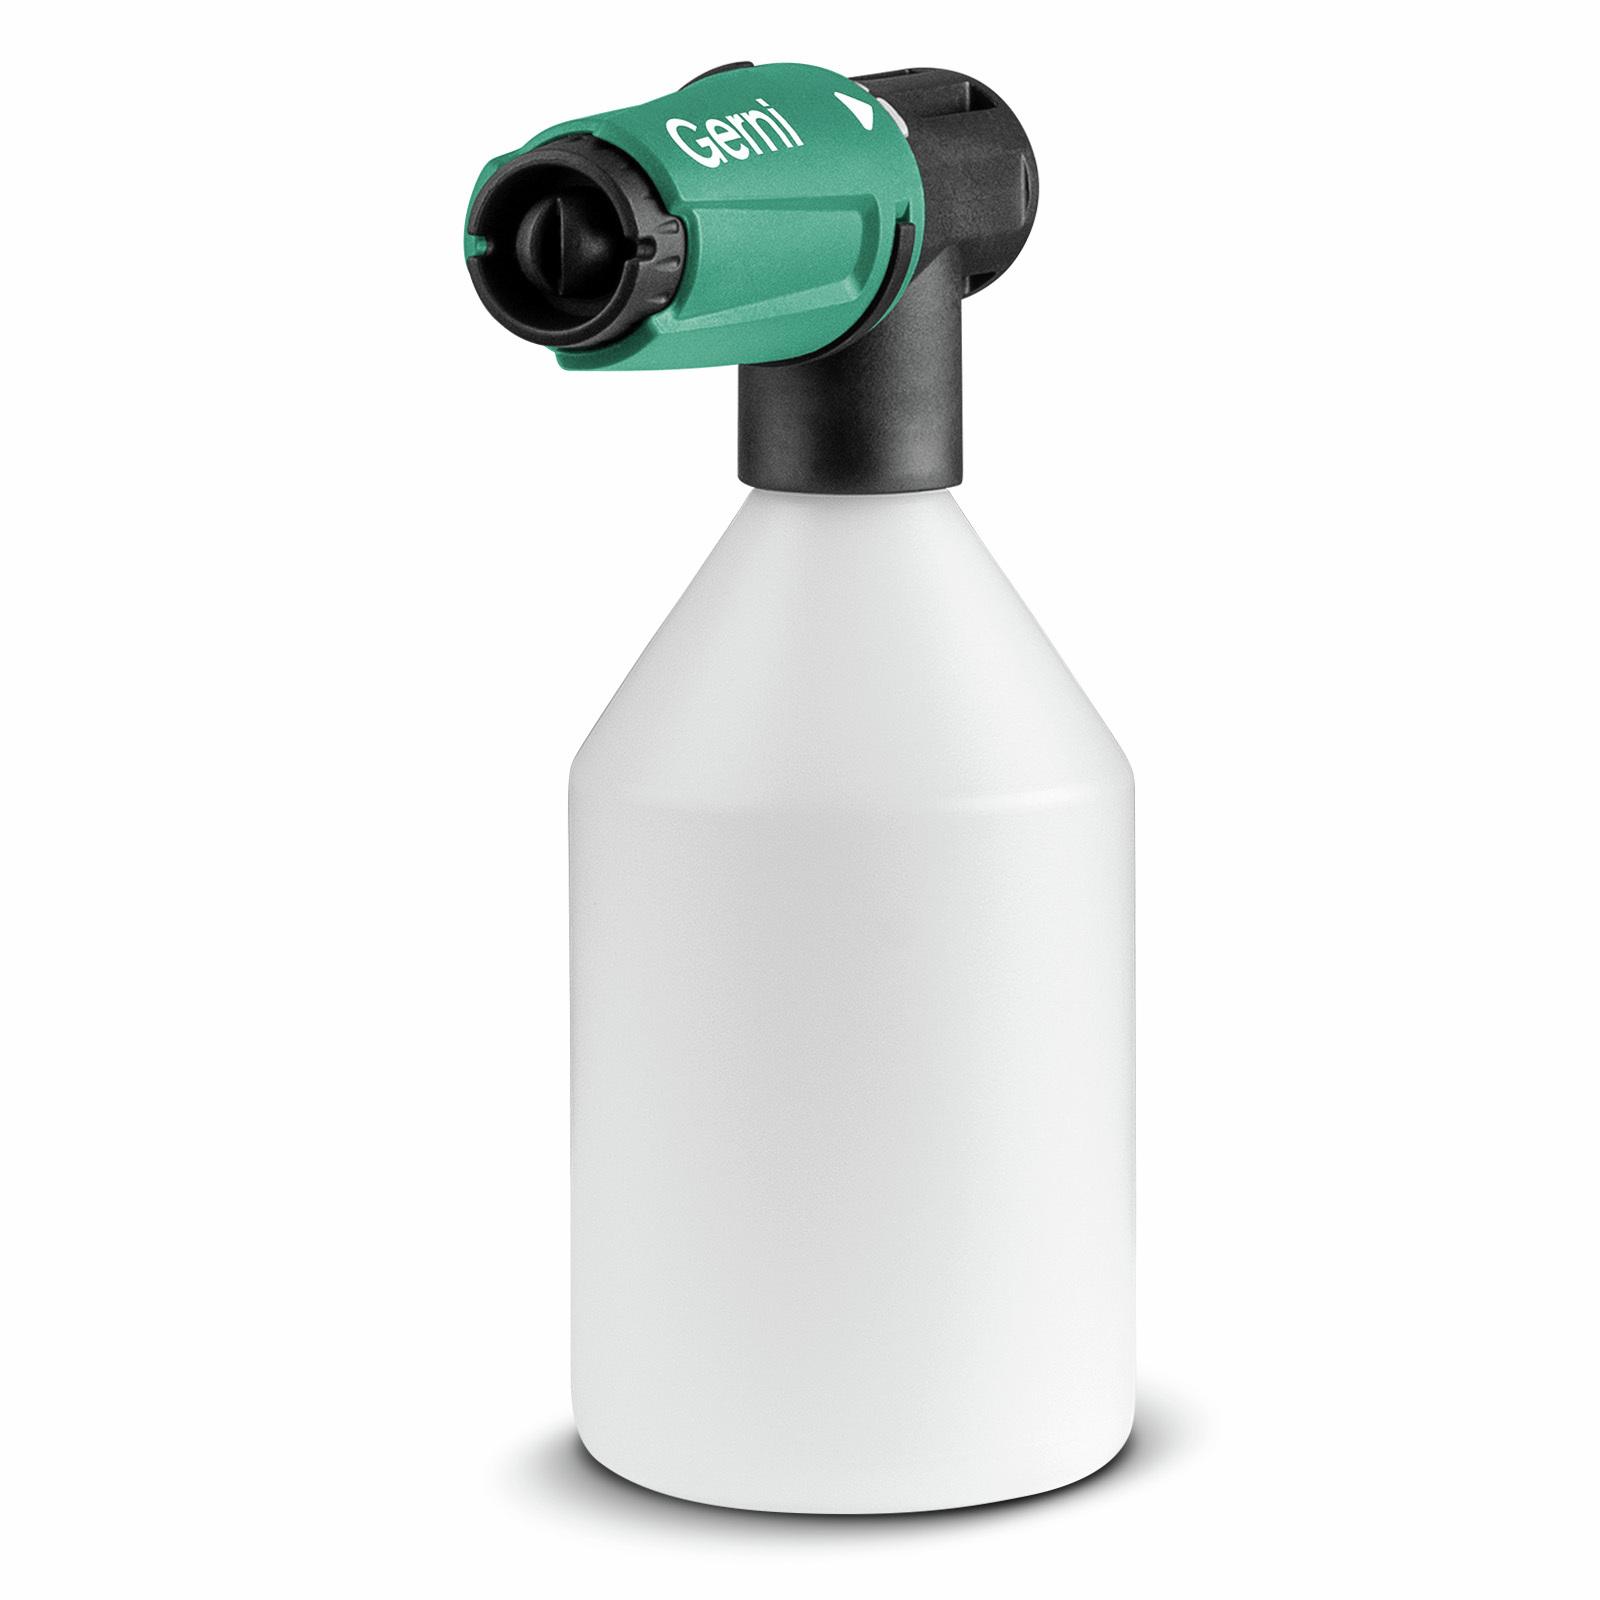 Gerni Super Foam Sprayer